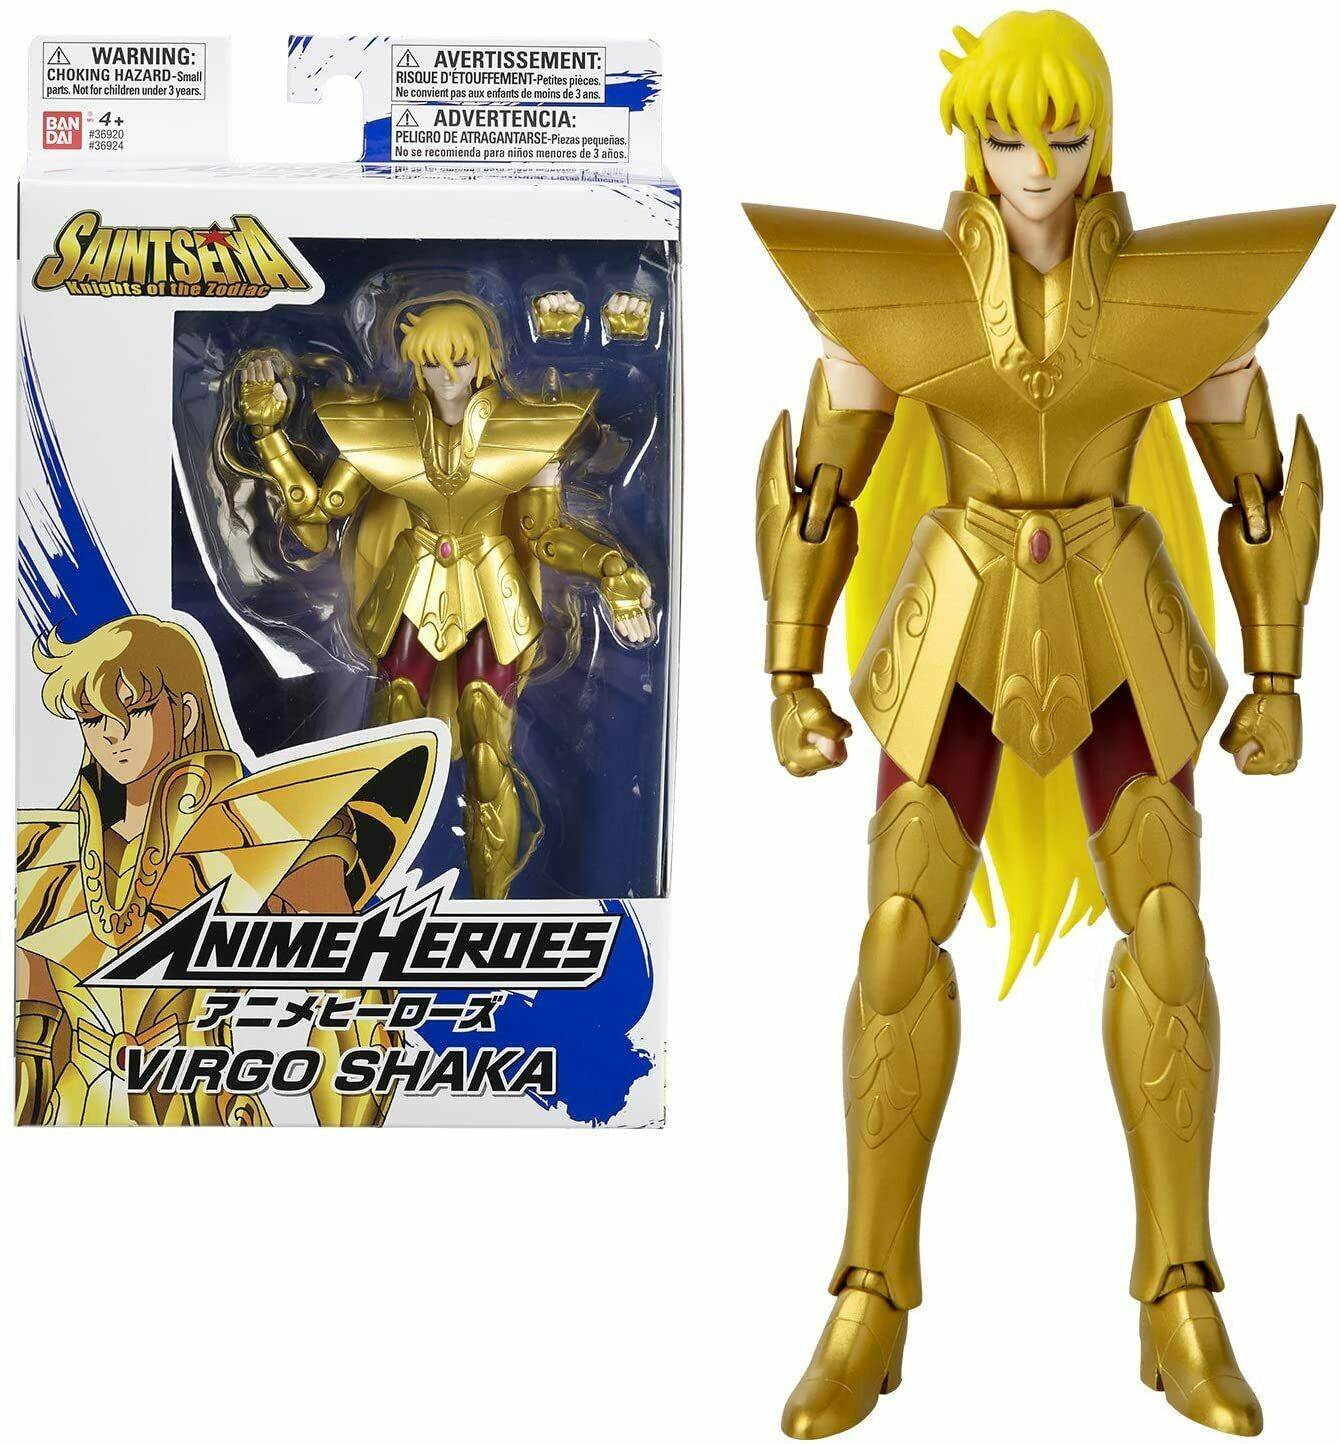 Action Figure Shaka de Virgem: Os Cavaleiros dos Zodíaco (Anime Heroes) Anime Mangá - Bandai